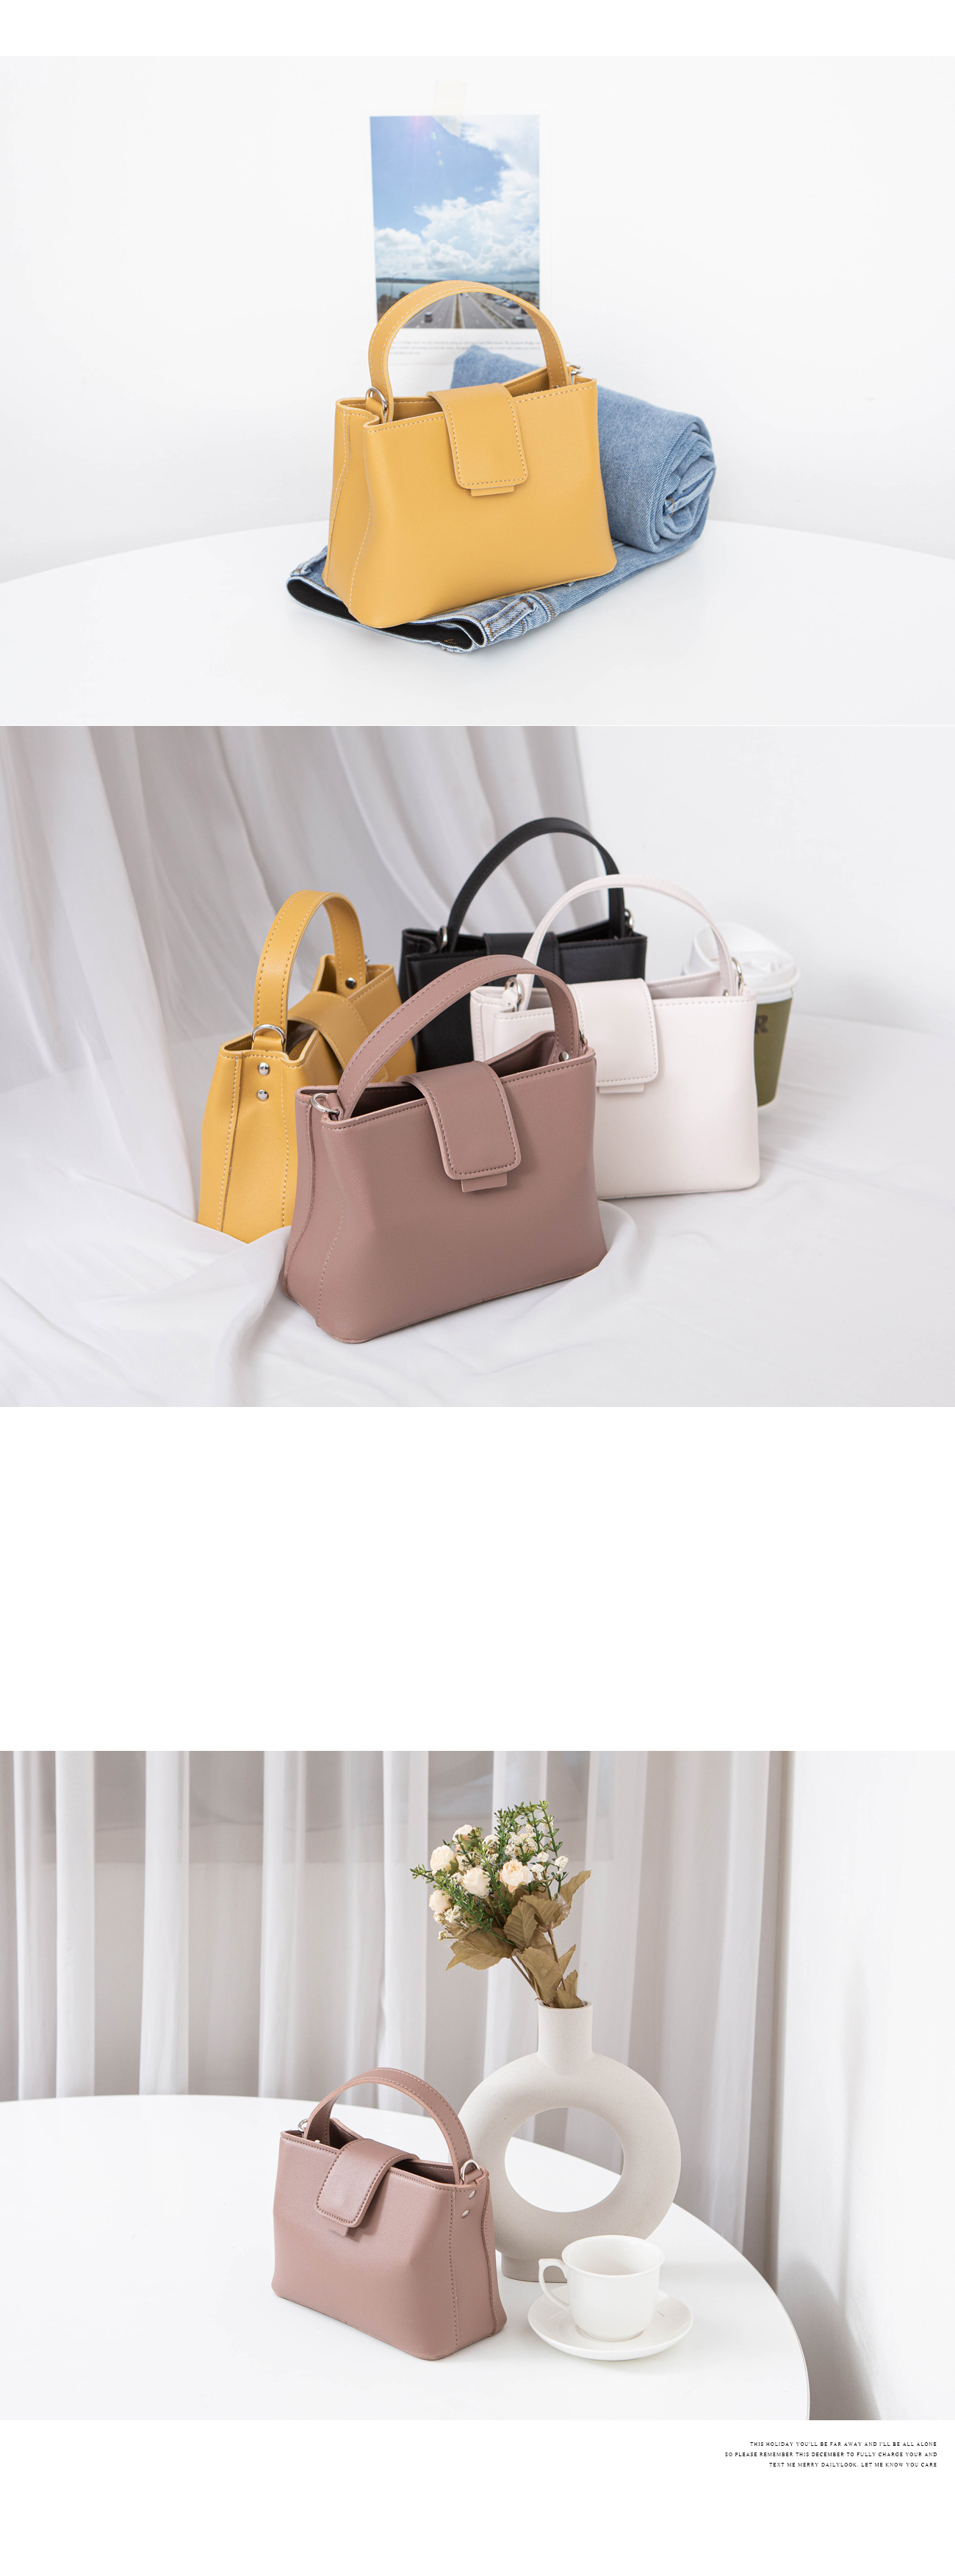 Mini Square Tote Cross Bag #86040